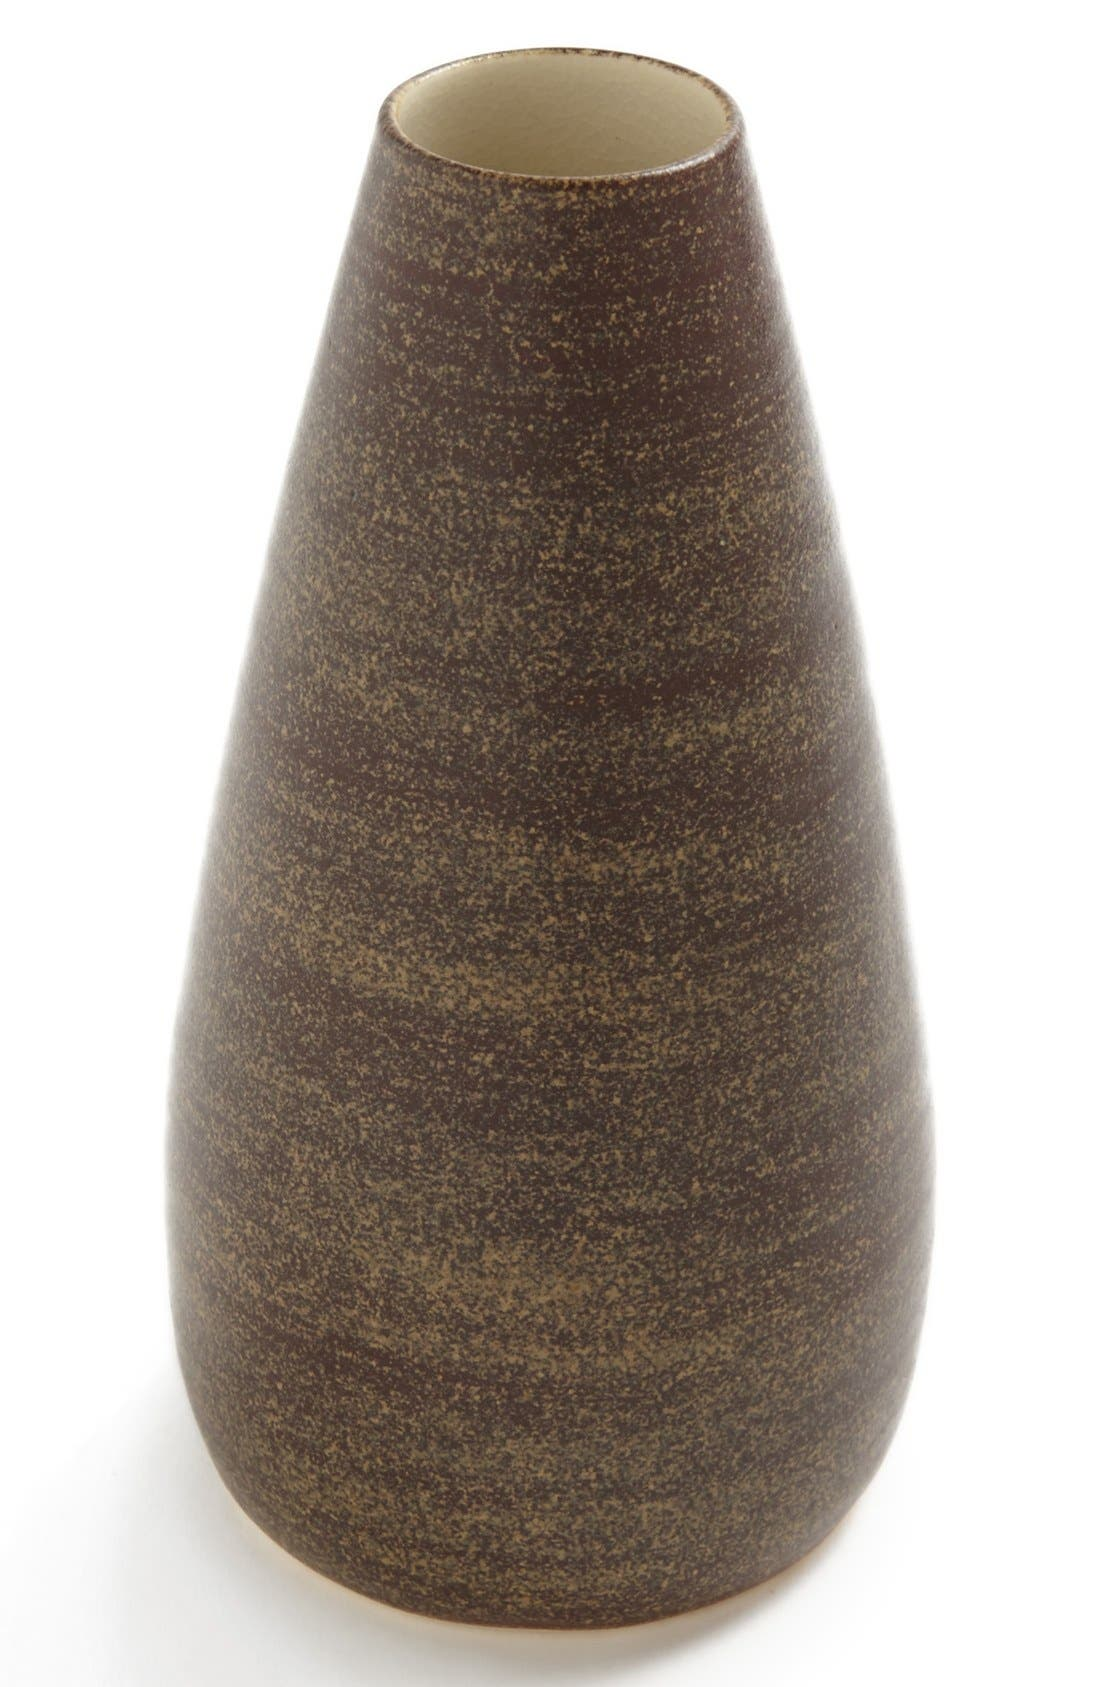 Alternate Image 1 Selected - Material Good Pod Vase